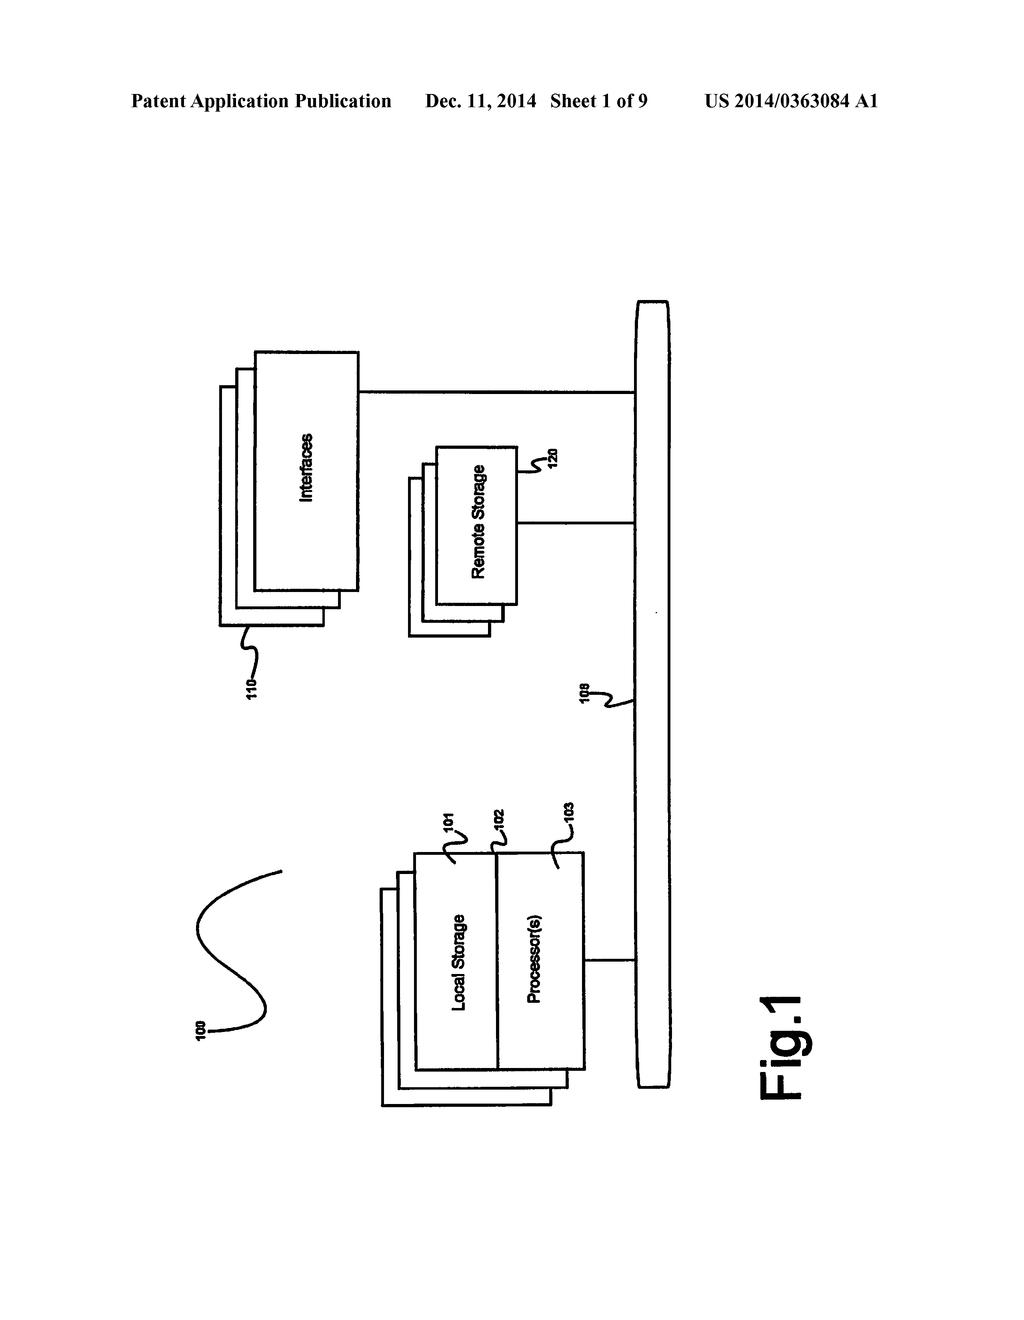 oil tank farm storage monitoring diagram schematic and image 02 rh patentsencyclopedia com